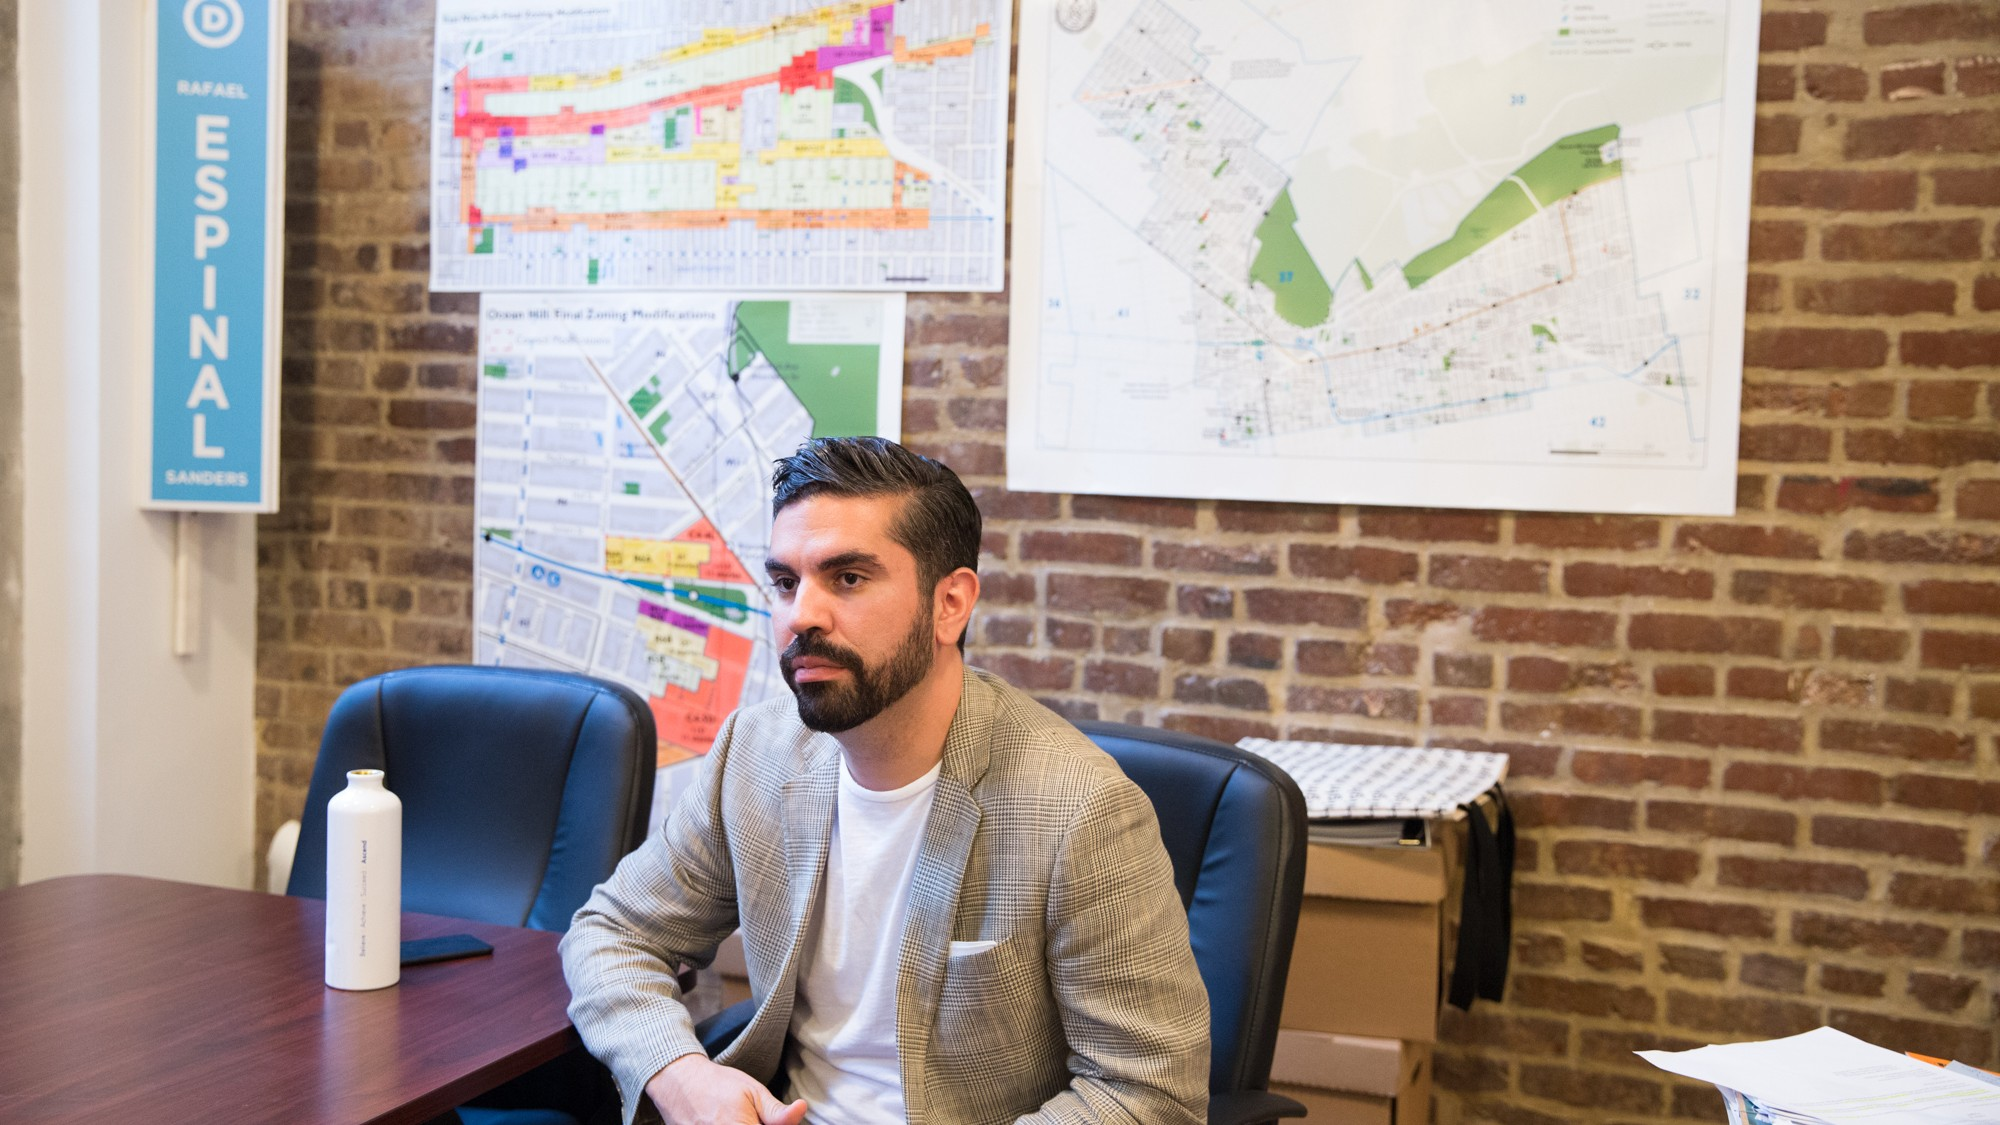 VICE: Riders on the L: Councilman Rafael L. Espinal